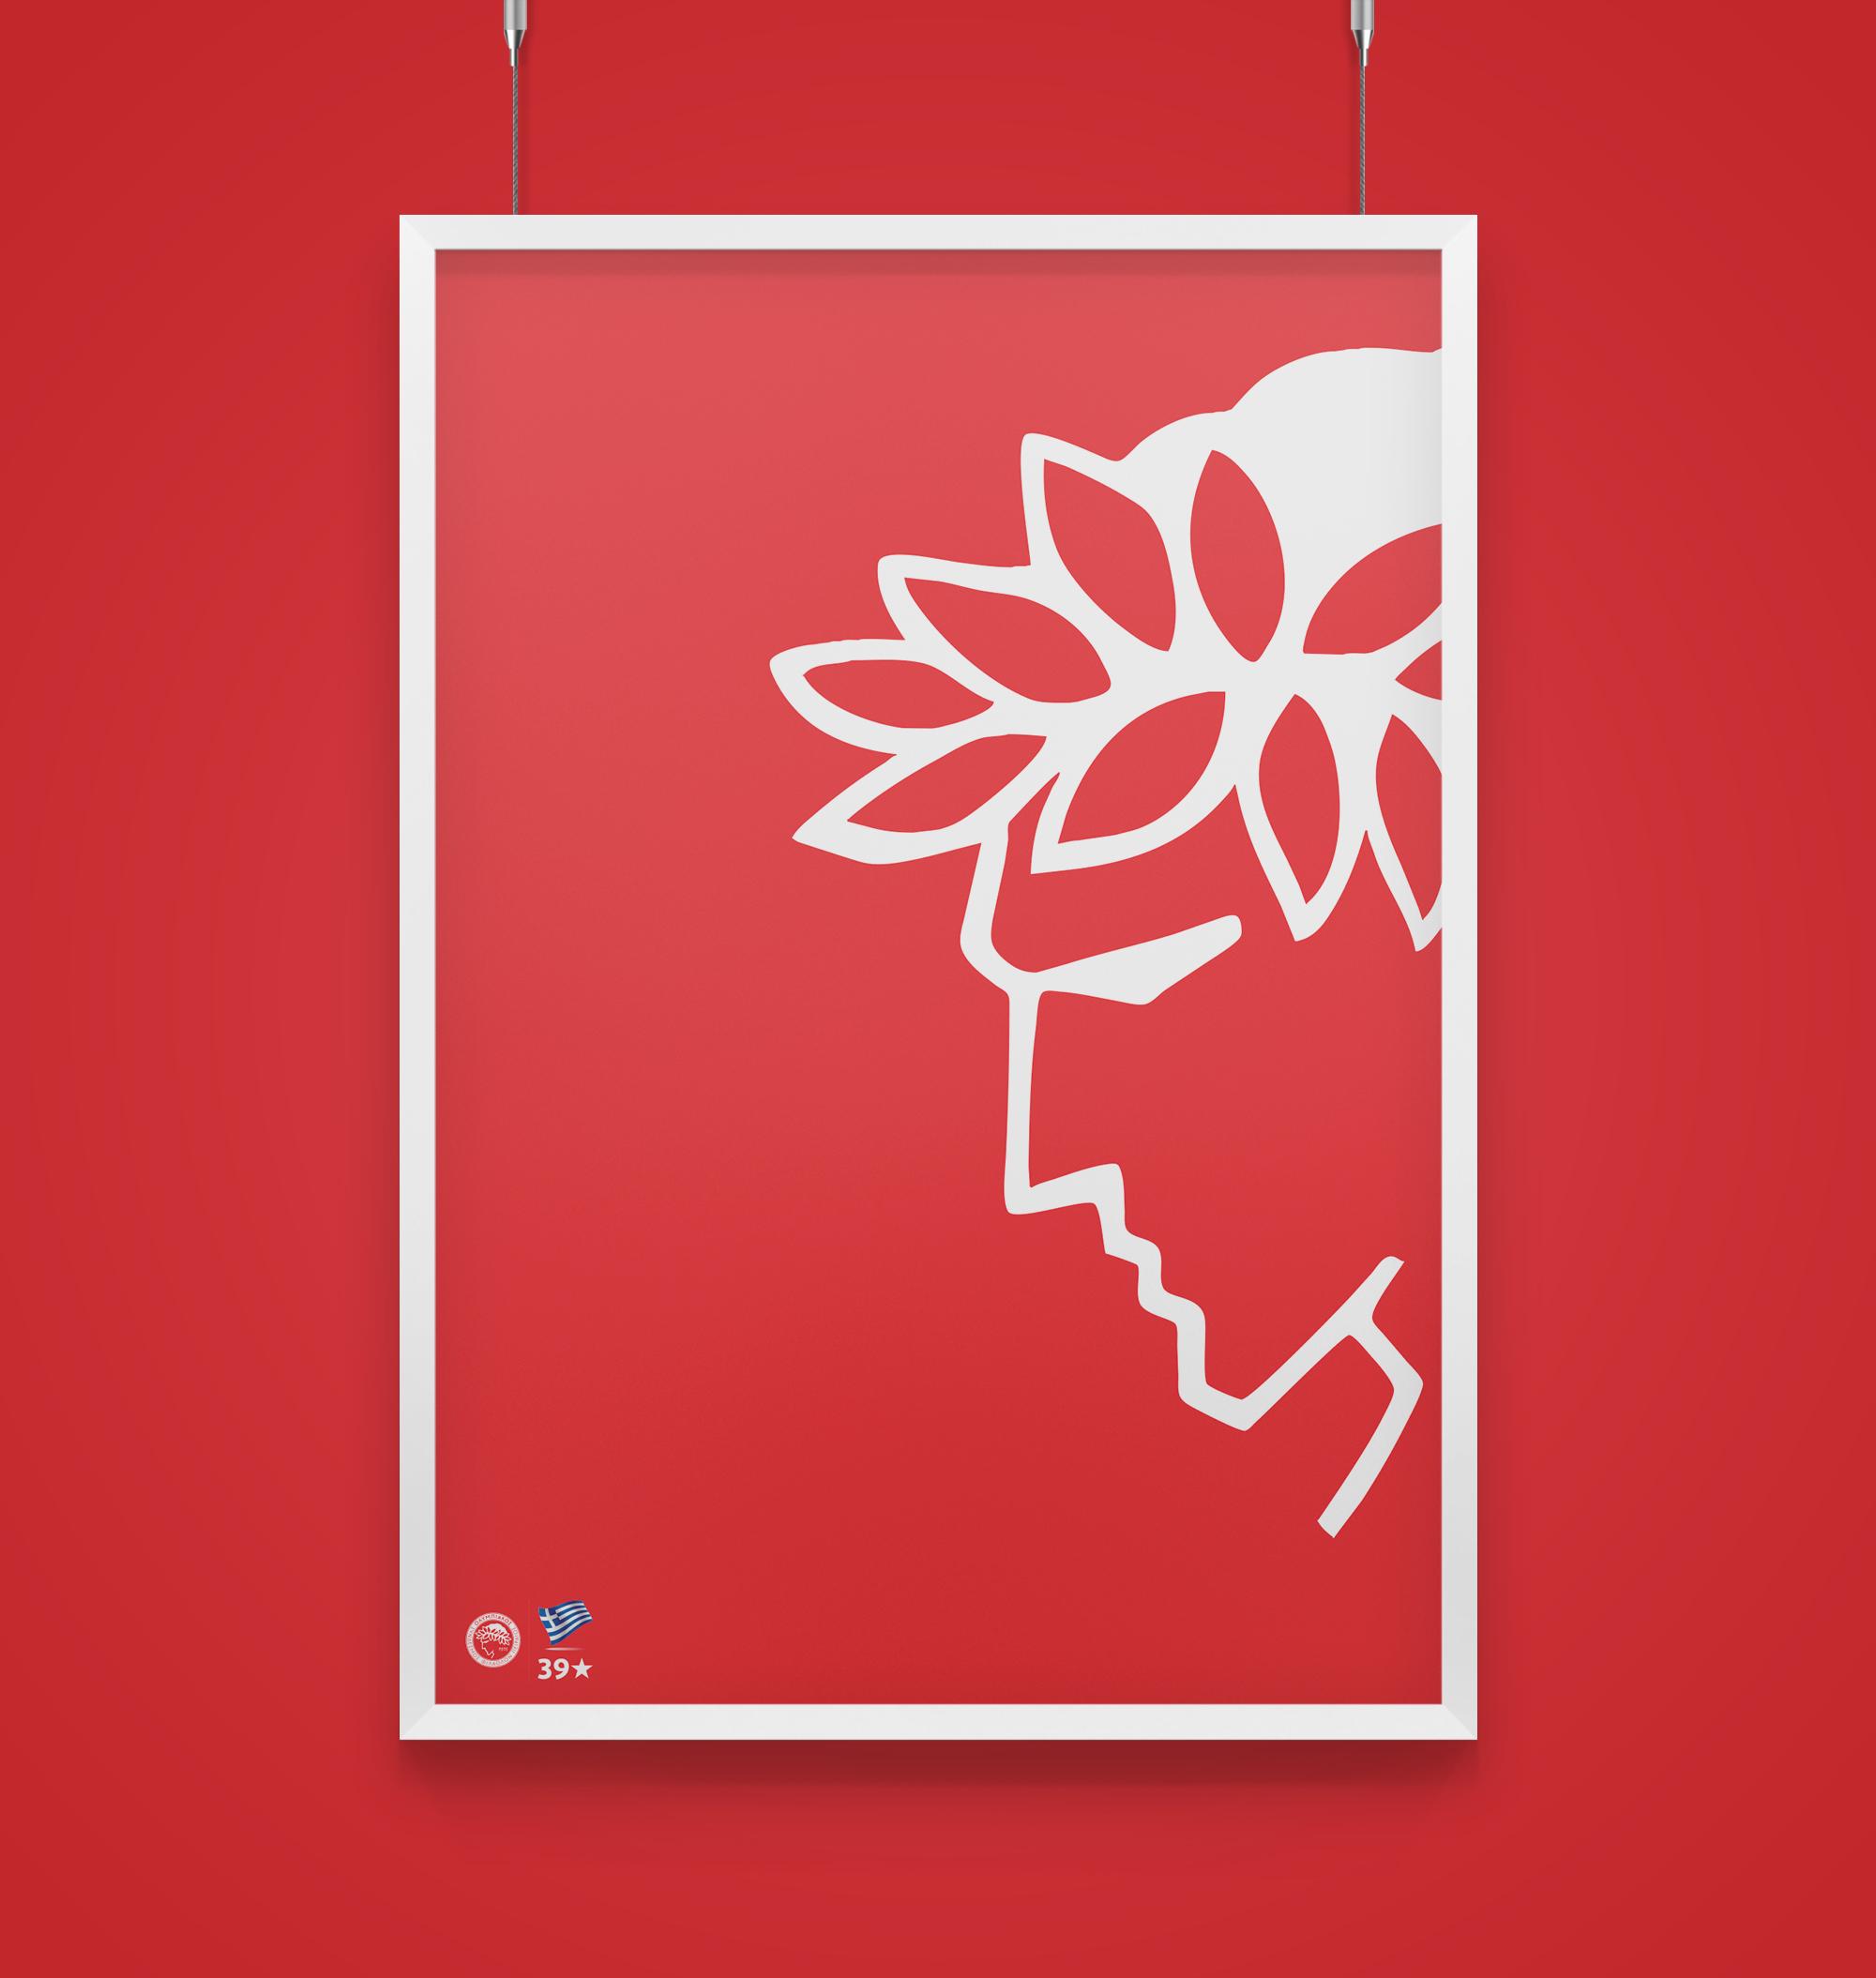 raniev-rod-alvarez-diseño-gráfico-queretaro-poster-minimalist-champions-6-olympiacos